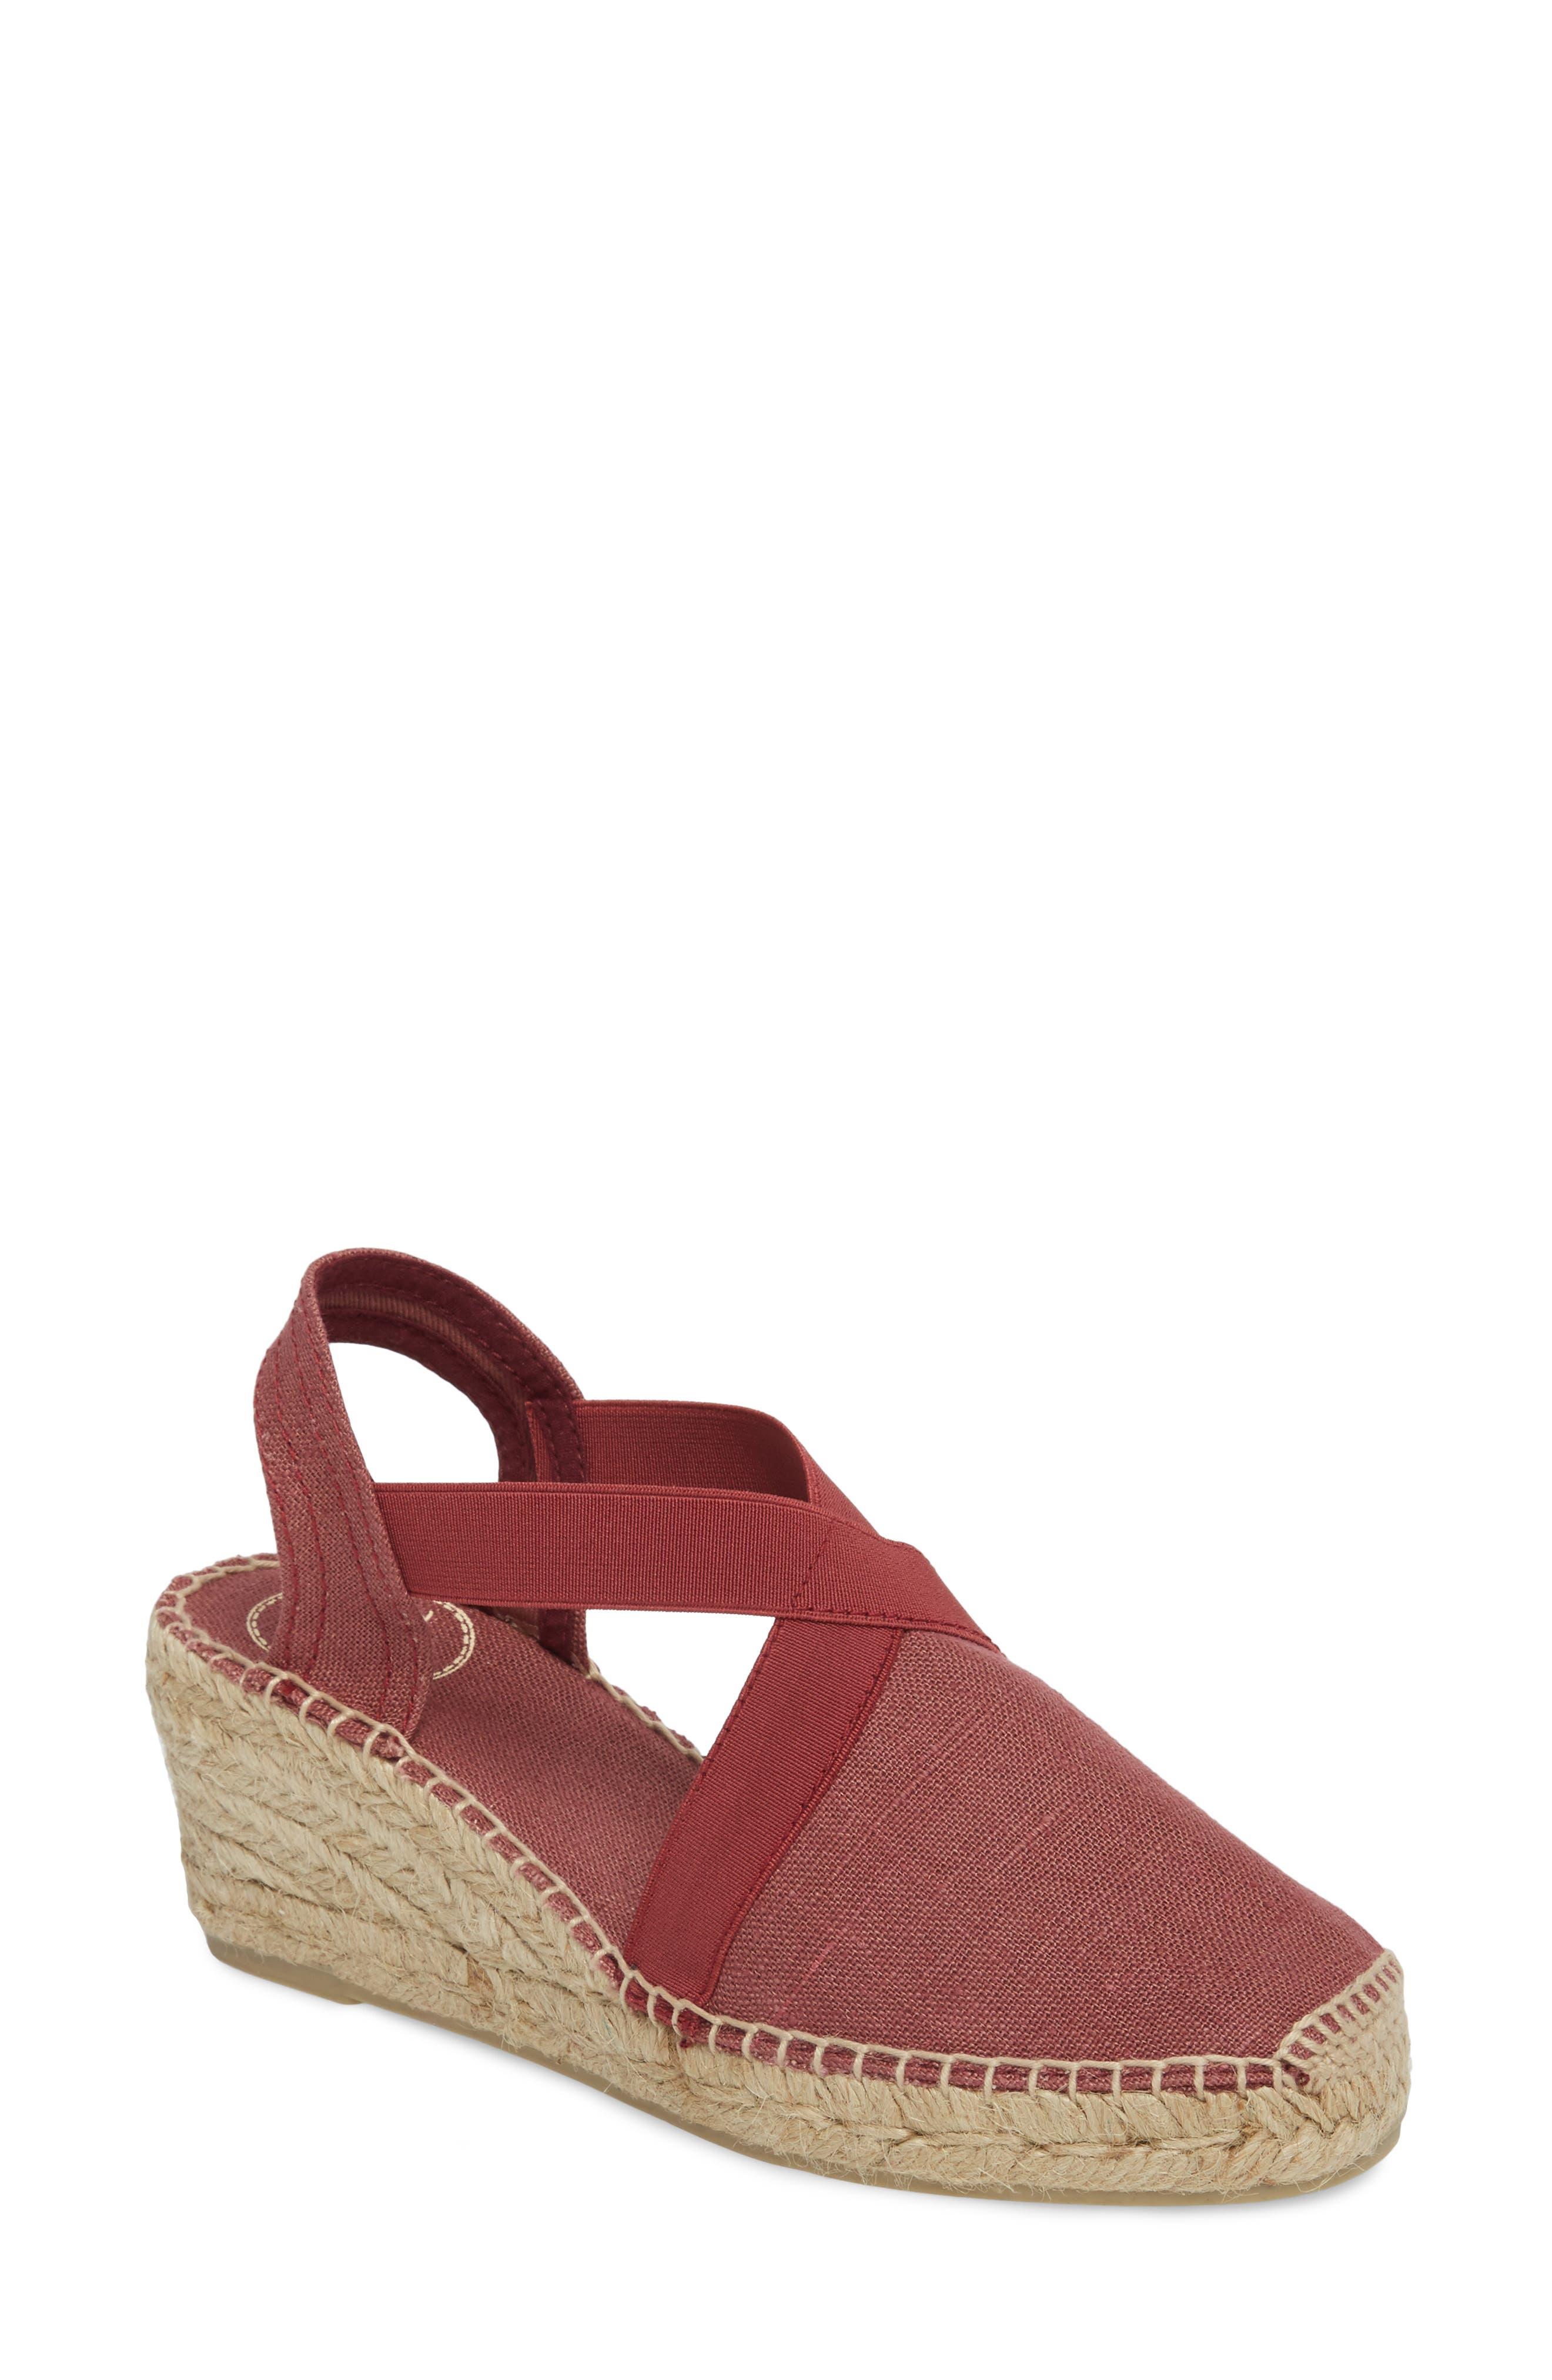 'Ter' Slingback Espadrille Sandal,                             Main thumbnail 1, color,                             Bru Fabric